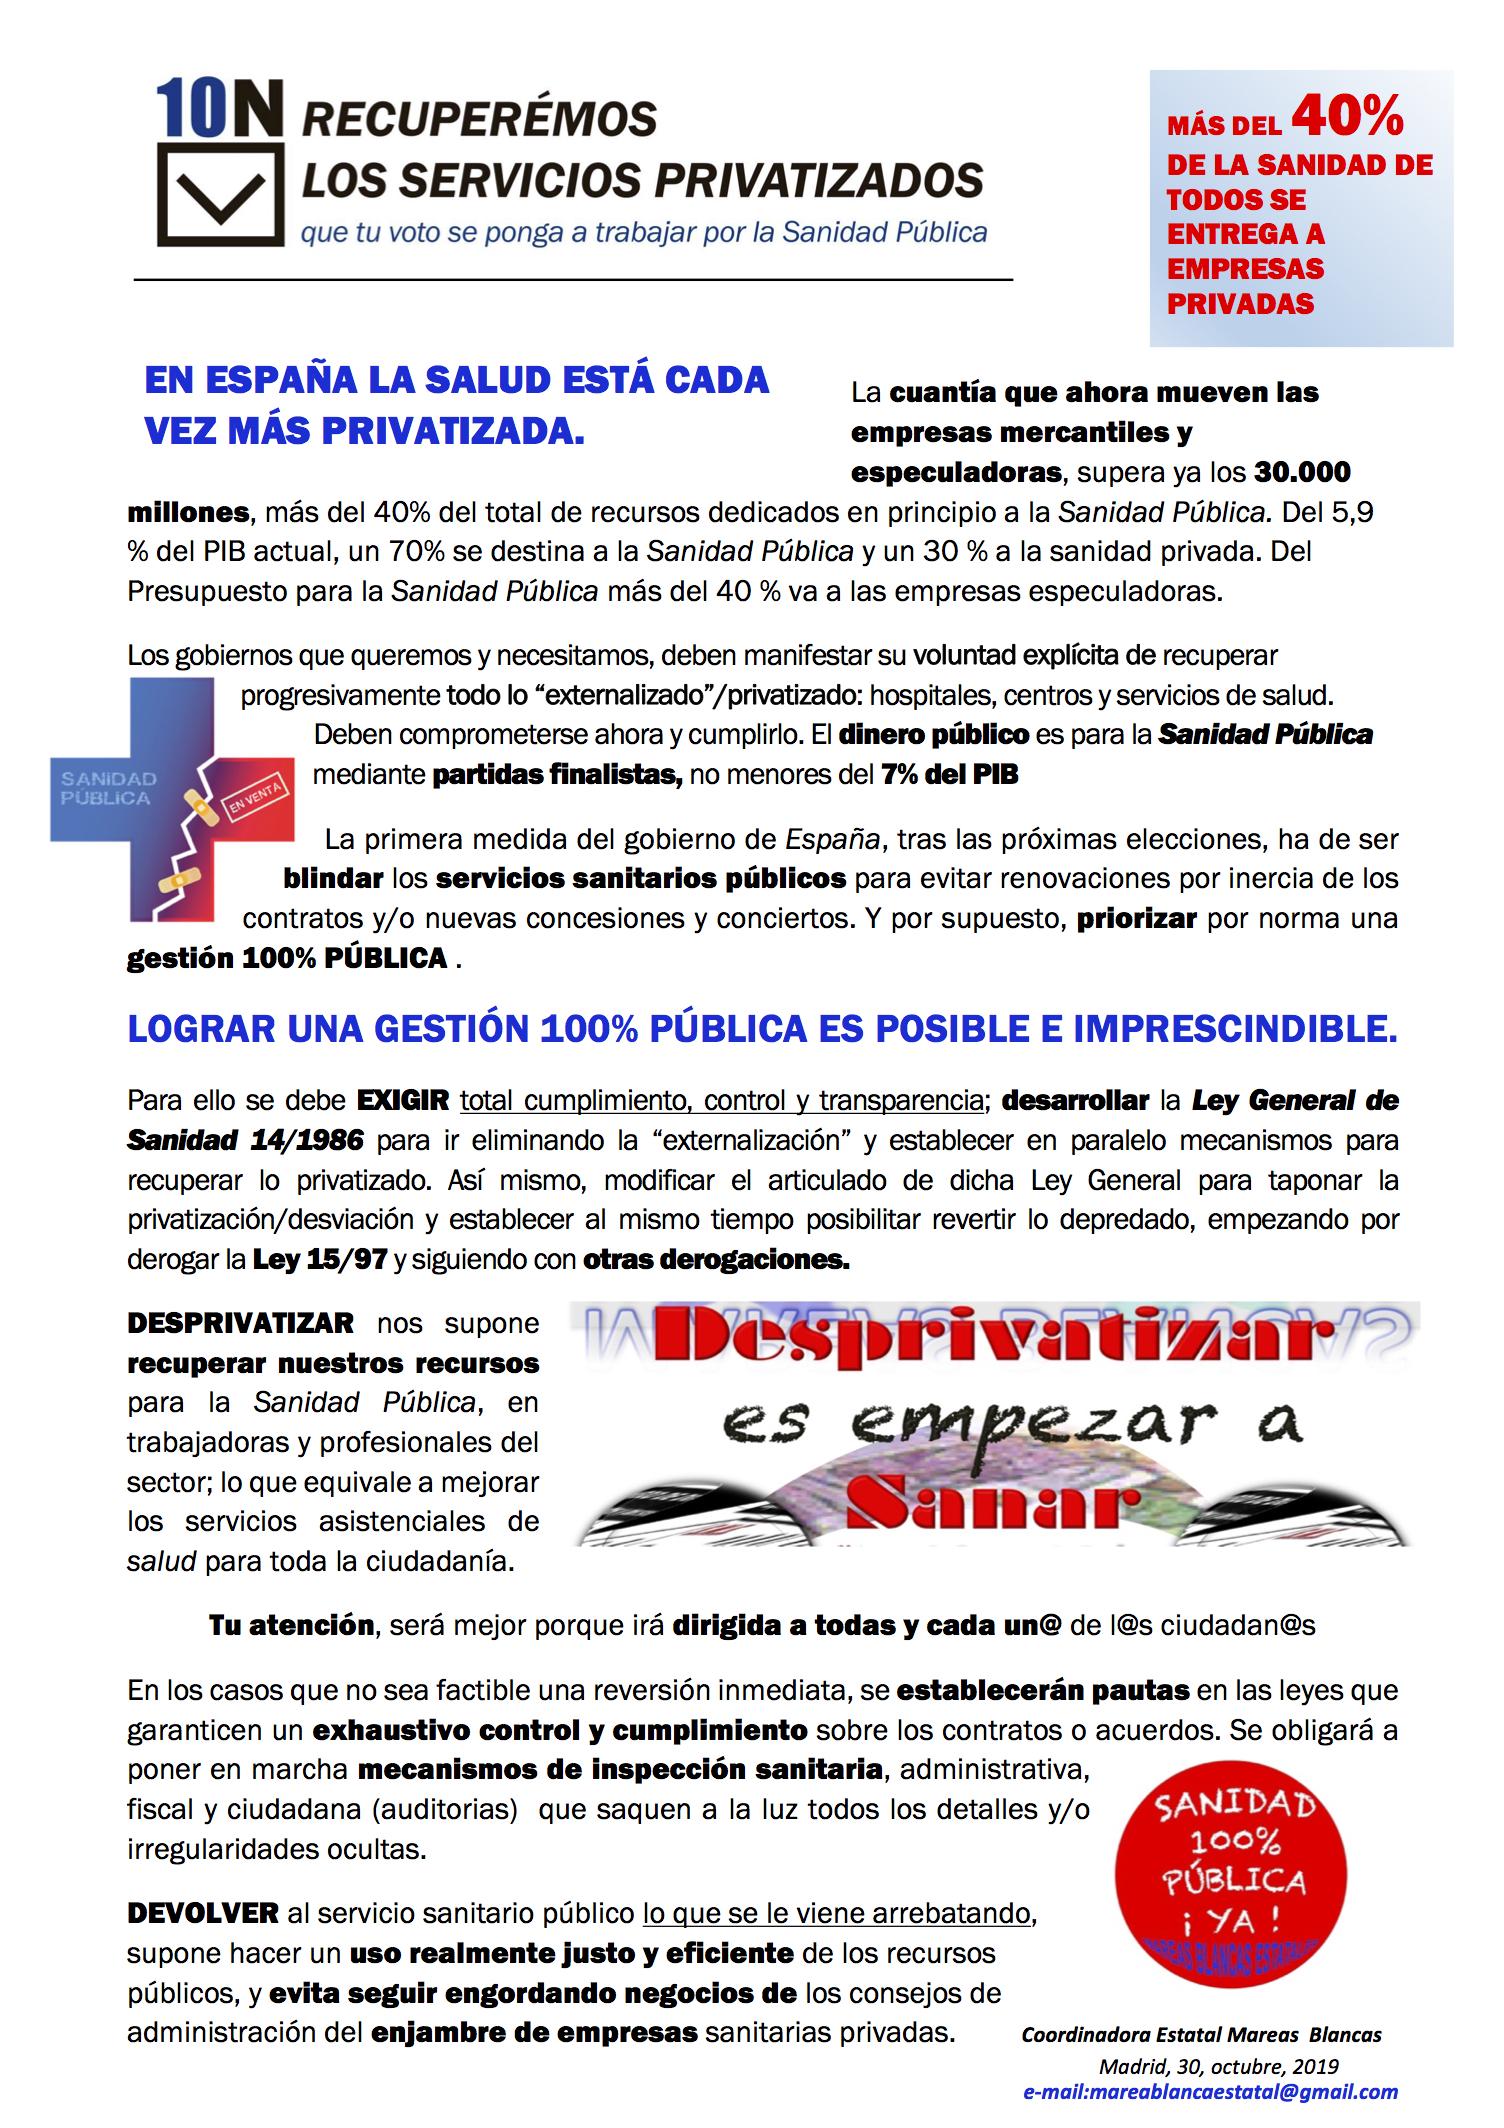 Boceto6.1 FOLLETO 10N COORD. ESTAT. MAREAS BLANCAS -Madrid